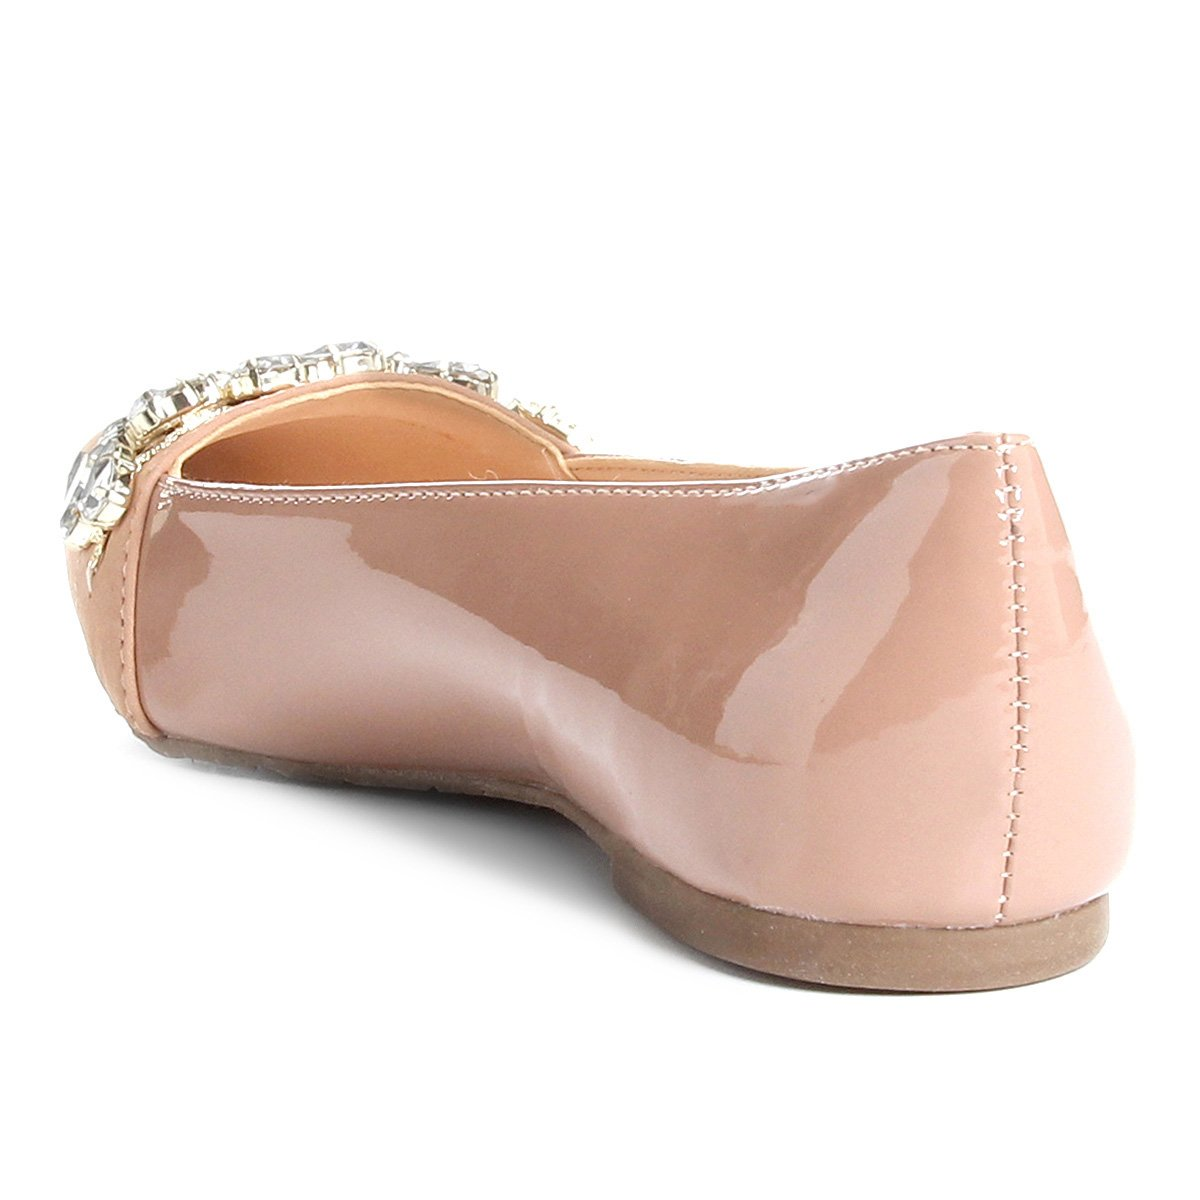 Shoestock Feminina Fino Bico Pedraria Nude Shoestock Sapatilha Sapatilha Couro Couro wYXqOIW8